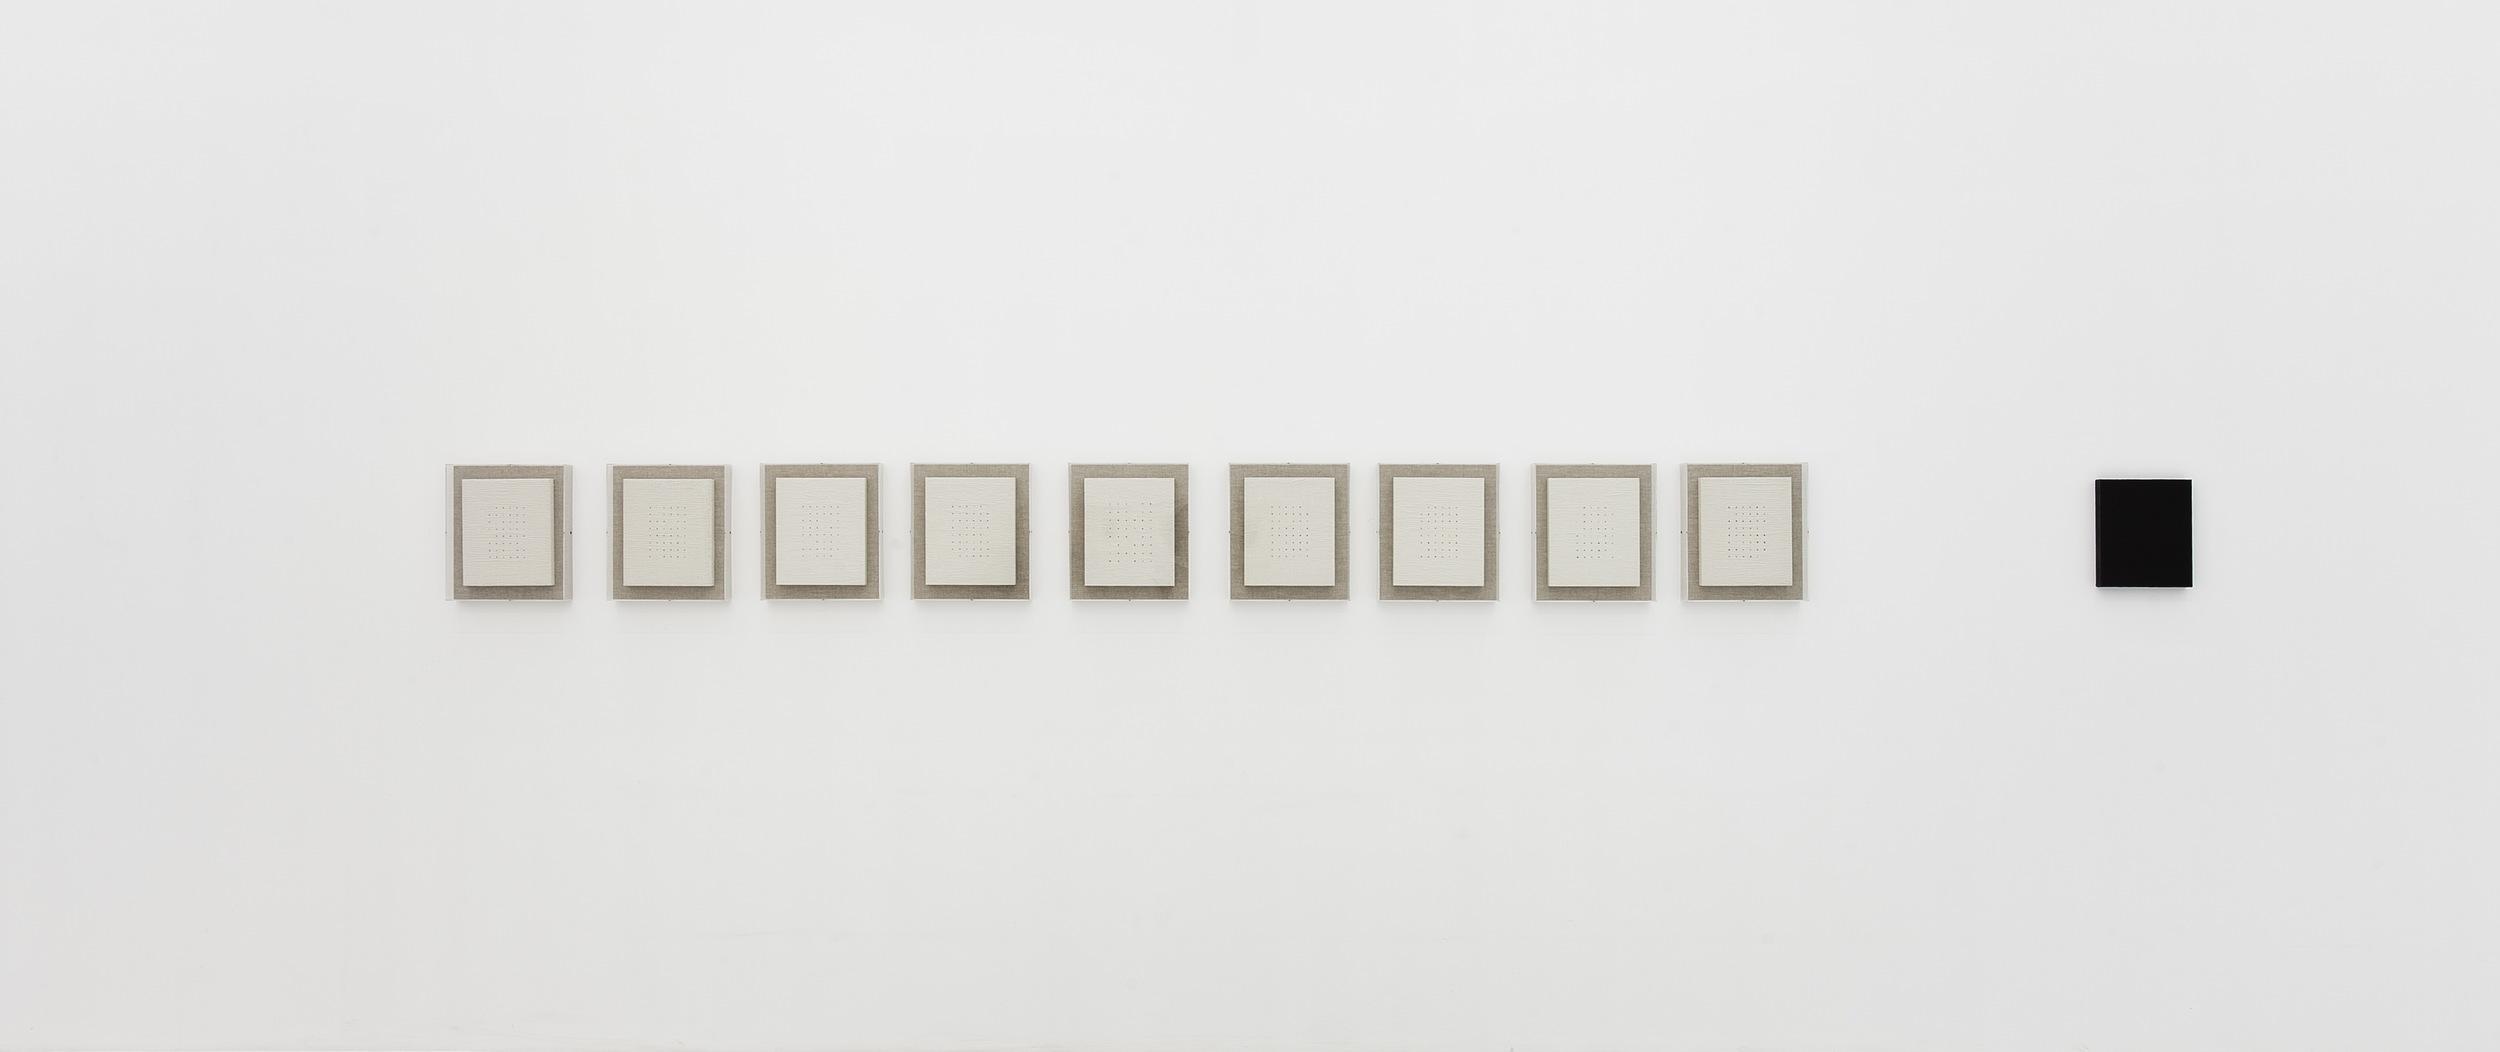 Liu Ren 刘任, How Much Land Does One Needs 一个人需要多少土地, 2013, Oil on straw paper mounted on board 油彩在裱在木板的草纸上, 30 x 25.4 cm x 10